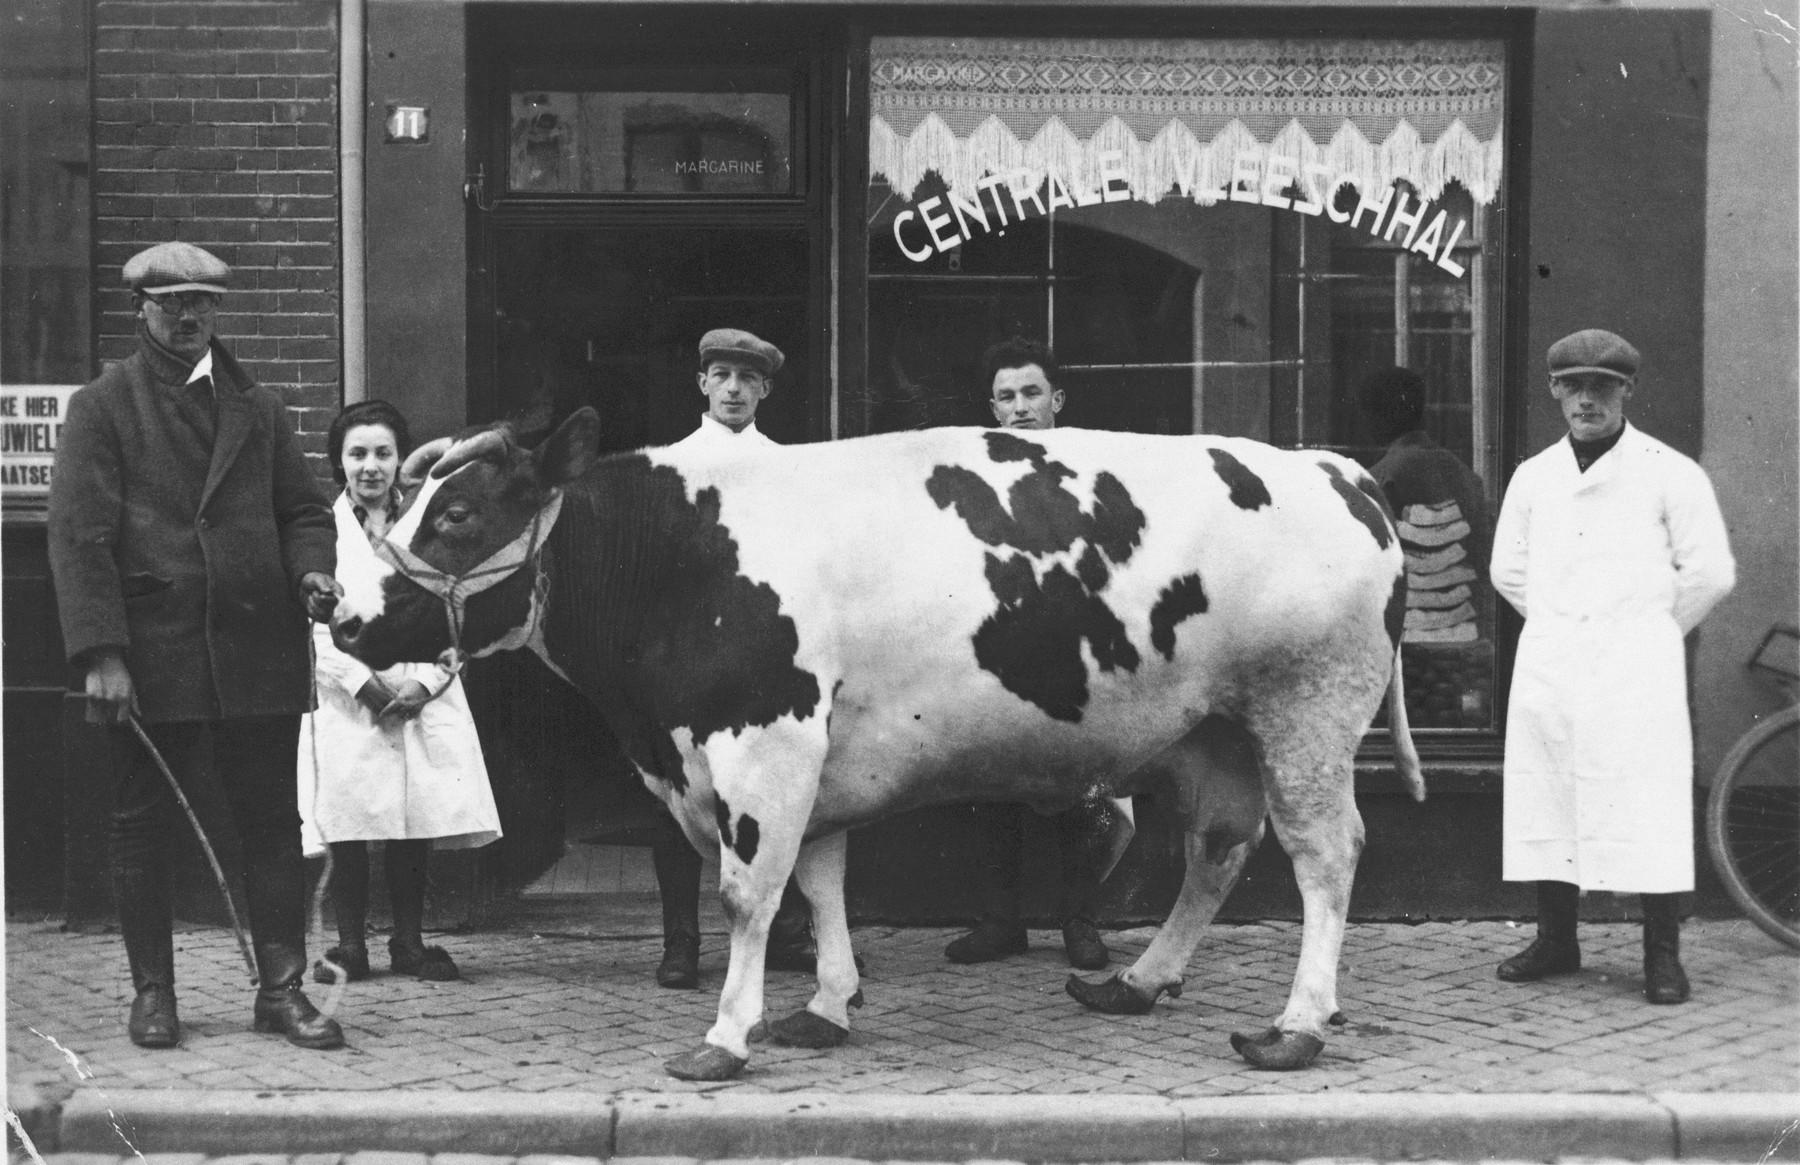 David and Sophia de Leeuw pose outside their butcher shop in Venlo, The Netherlands.